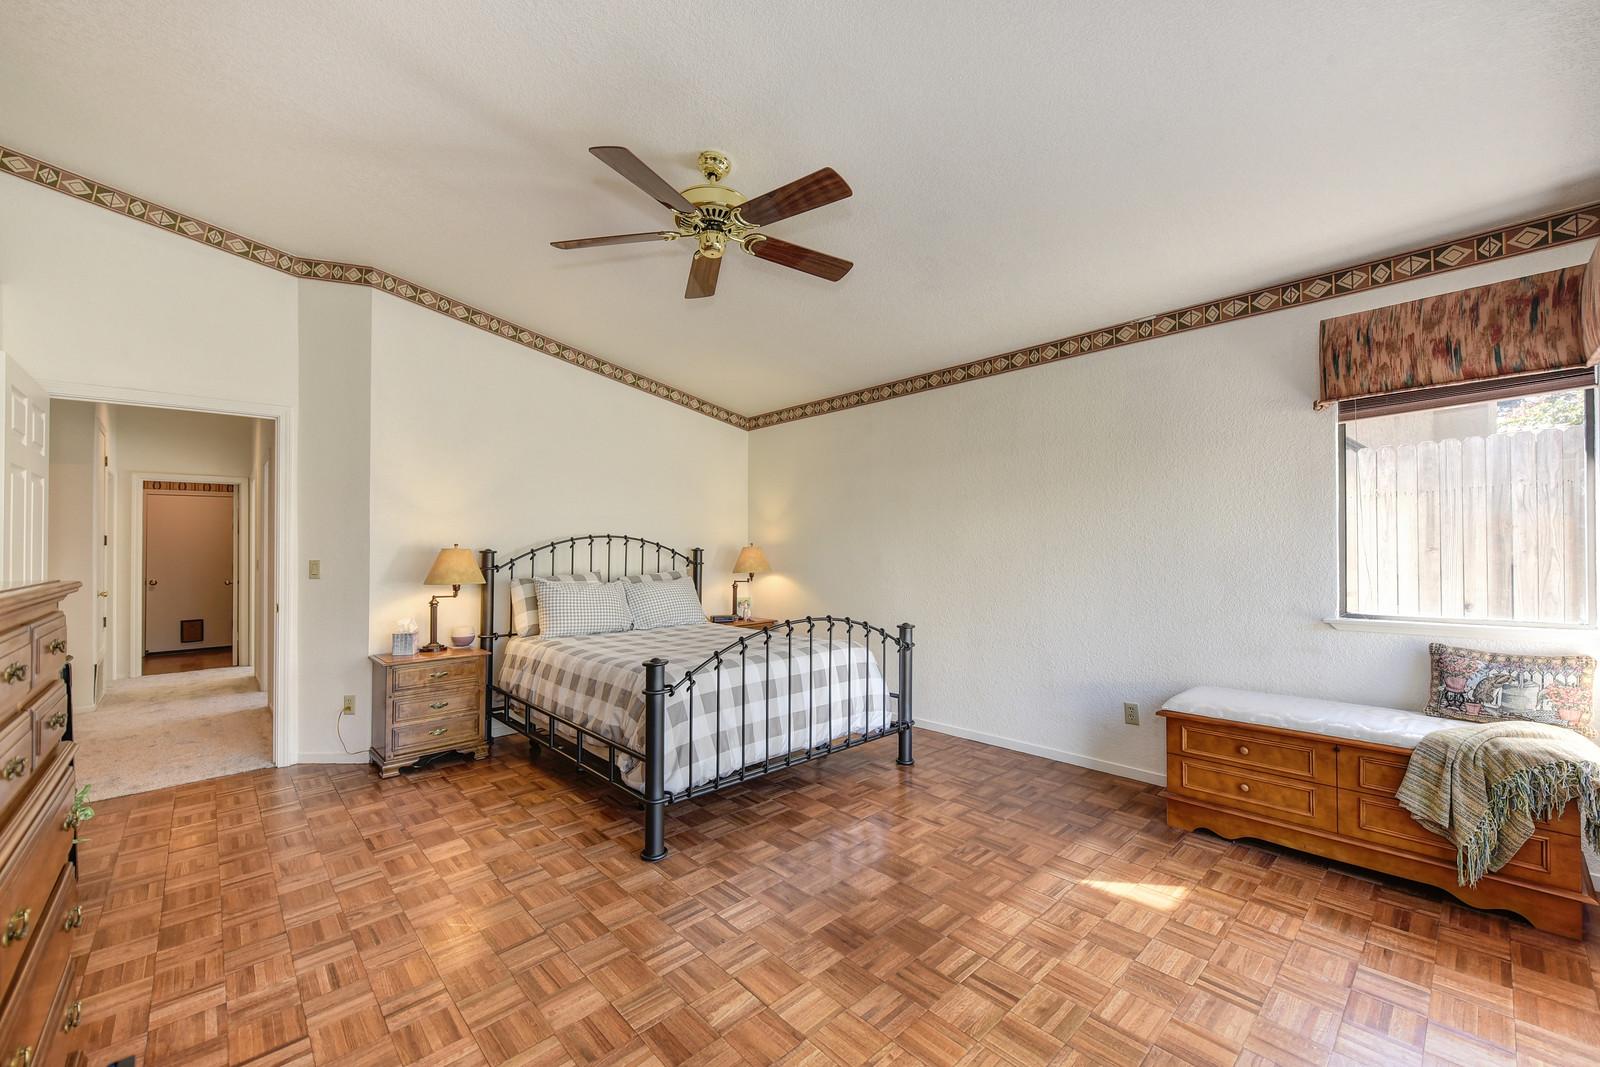 Elk Grove California home for sale | 9158 Old Creek Rd master bedroom | Real Estate Agent in Elk Grove California